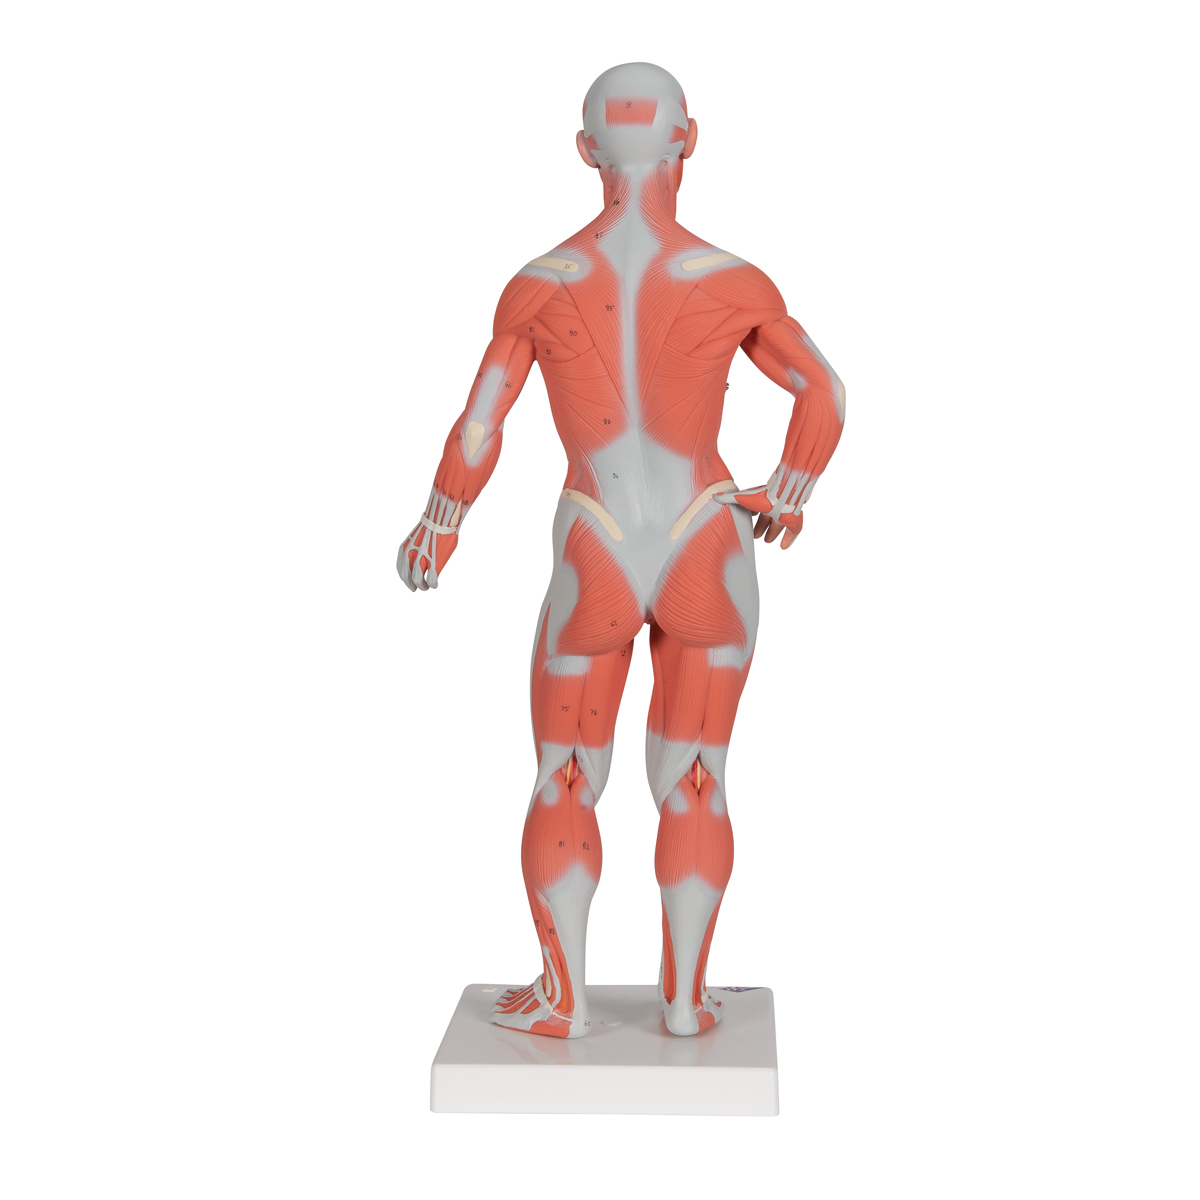 Muscle man model anatomy